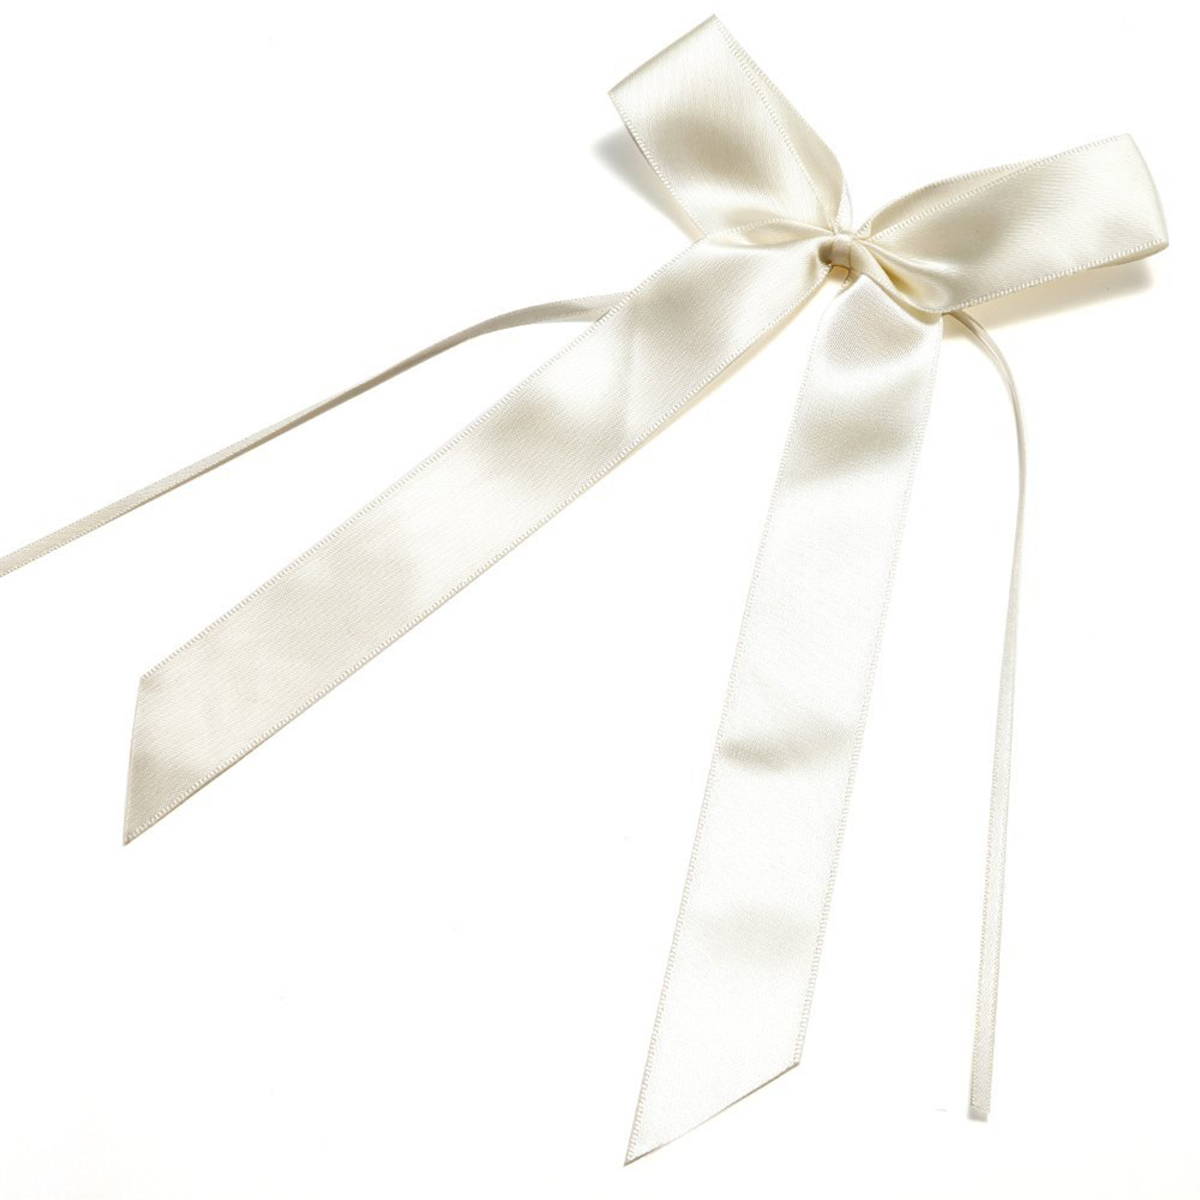 25pcs Wedding Party Chair Cover Decorations Sheer Organza Sashes Bow Tie Ribbon Supplies Banquet Bowknots Multicolors